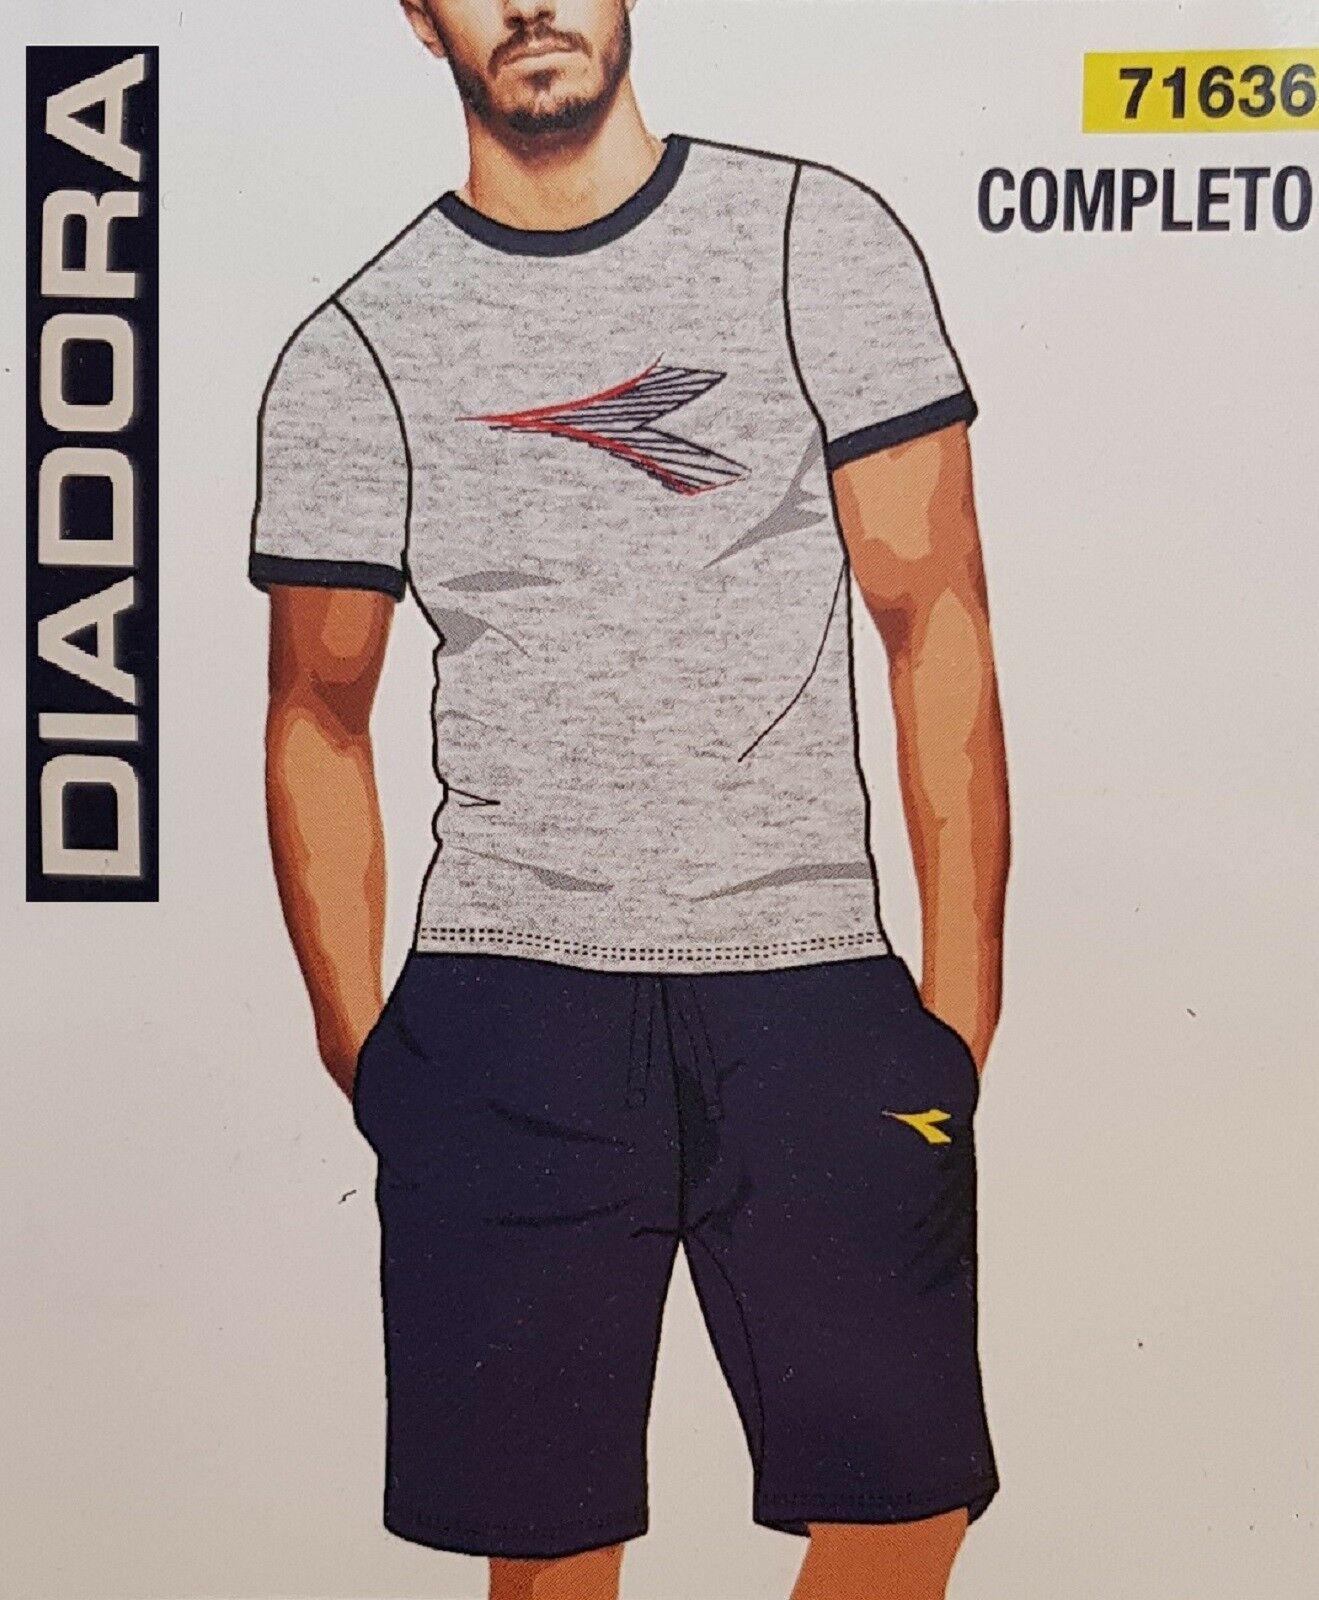 DIADORA Beachwear. Completo mare Uomo in 100% Cotone. 71636.